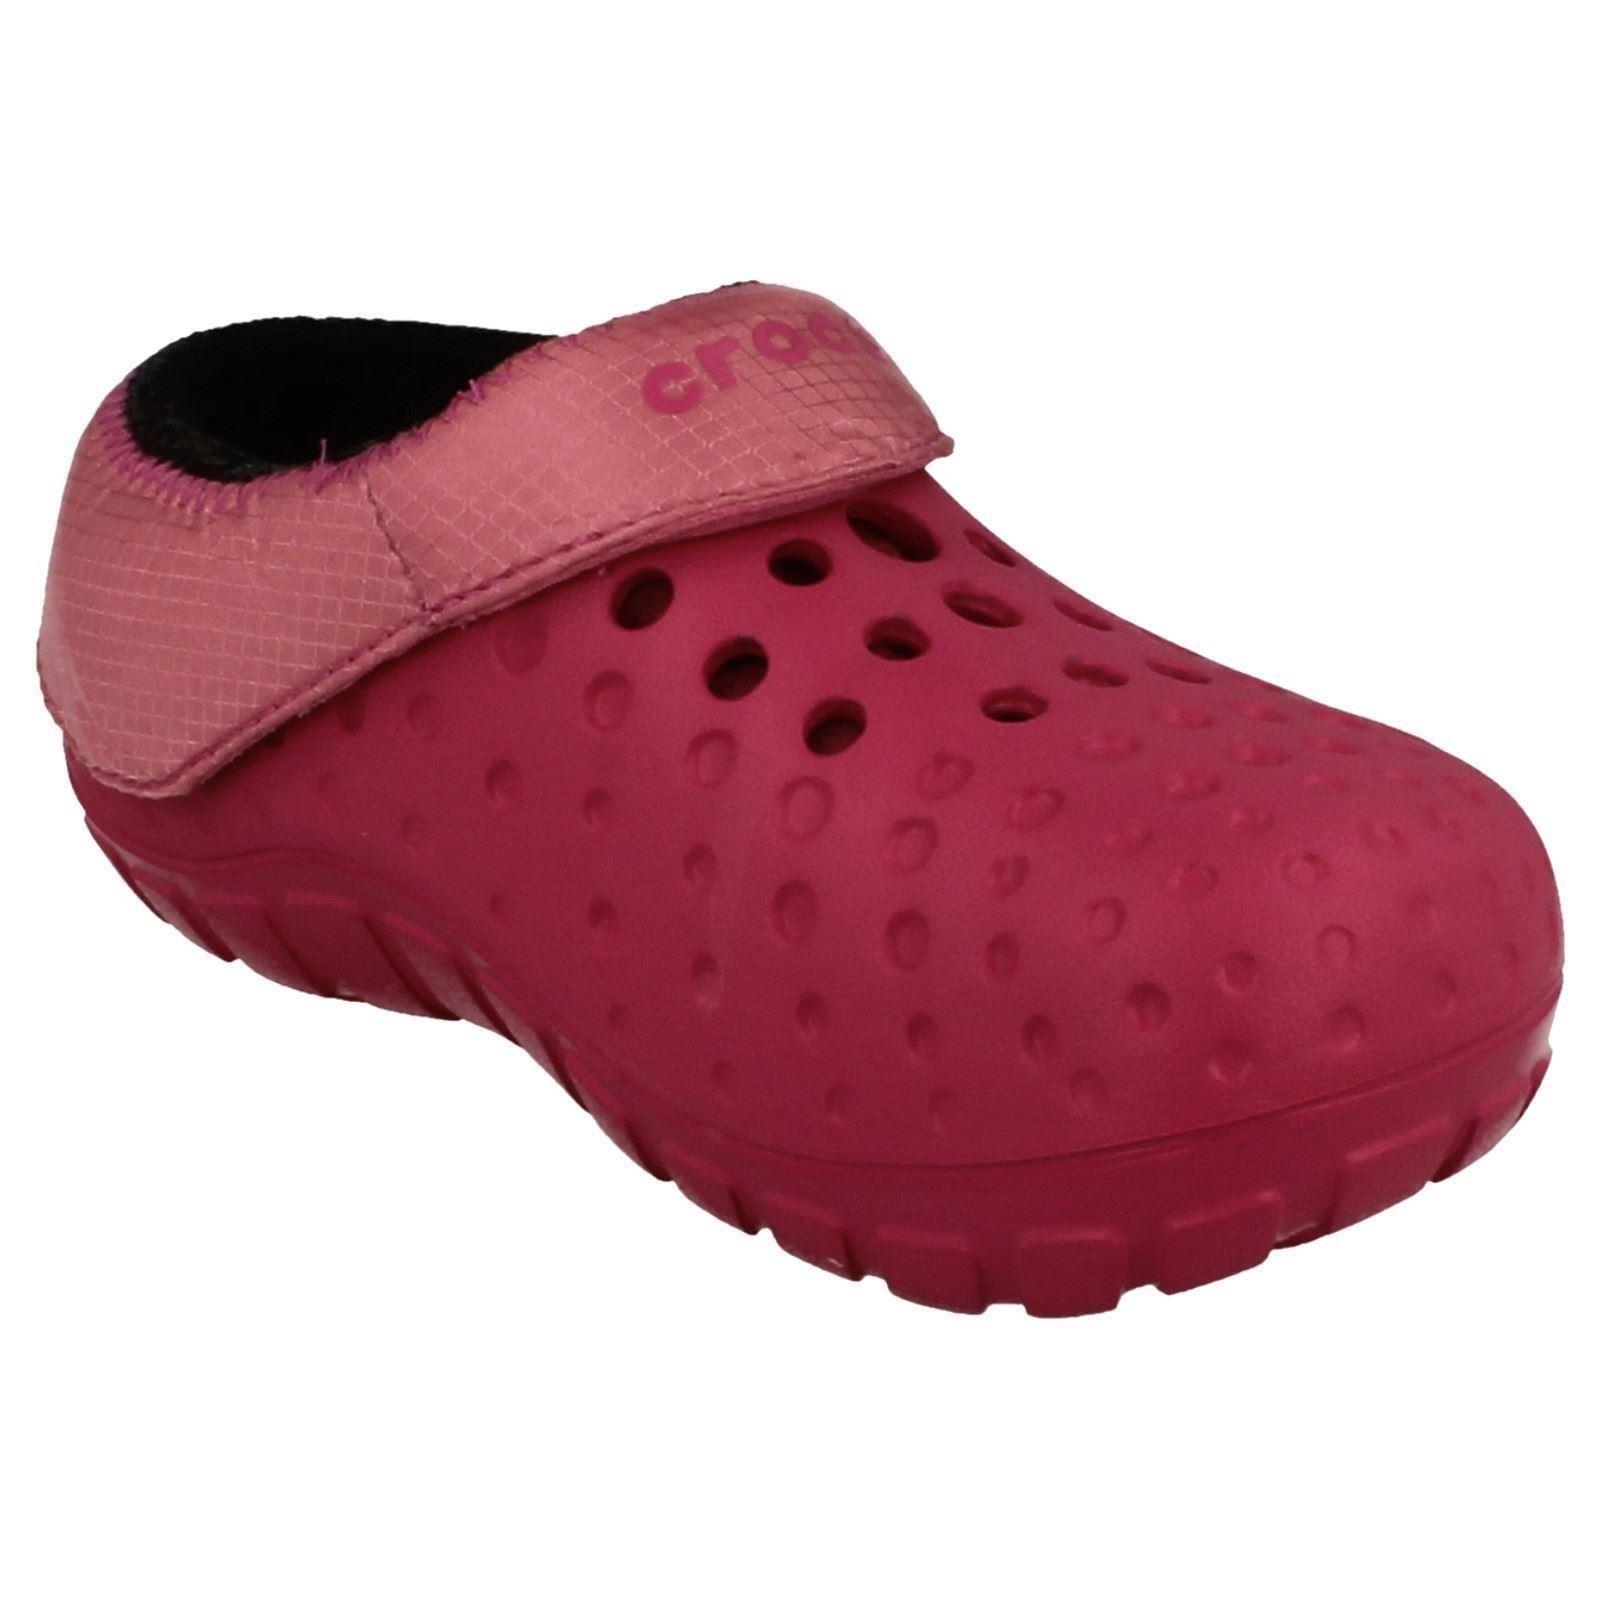 Girls Crocs Slip On Mules /'Tembo Polartec Kids/'